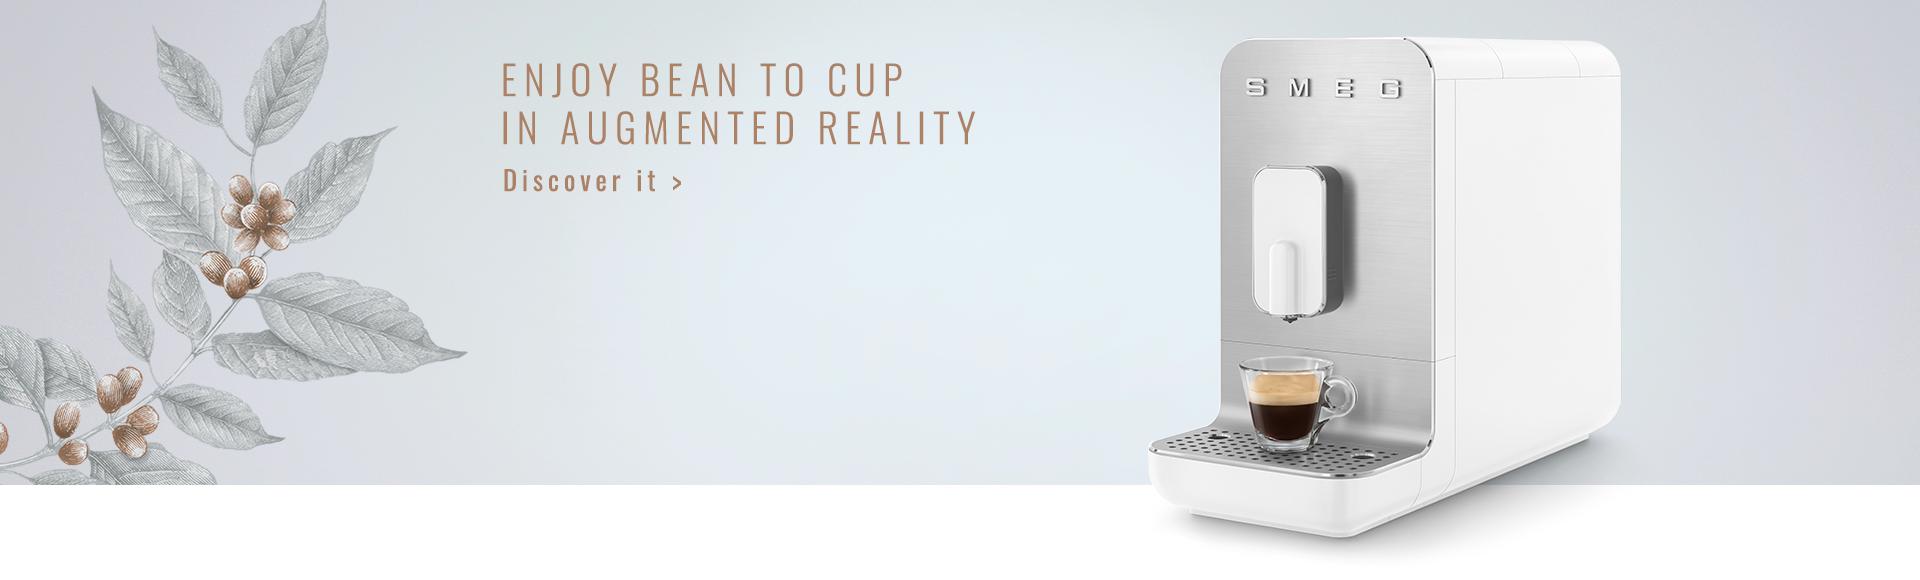 Bean to Cup Μηχανή Καφέ